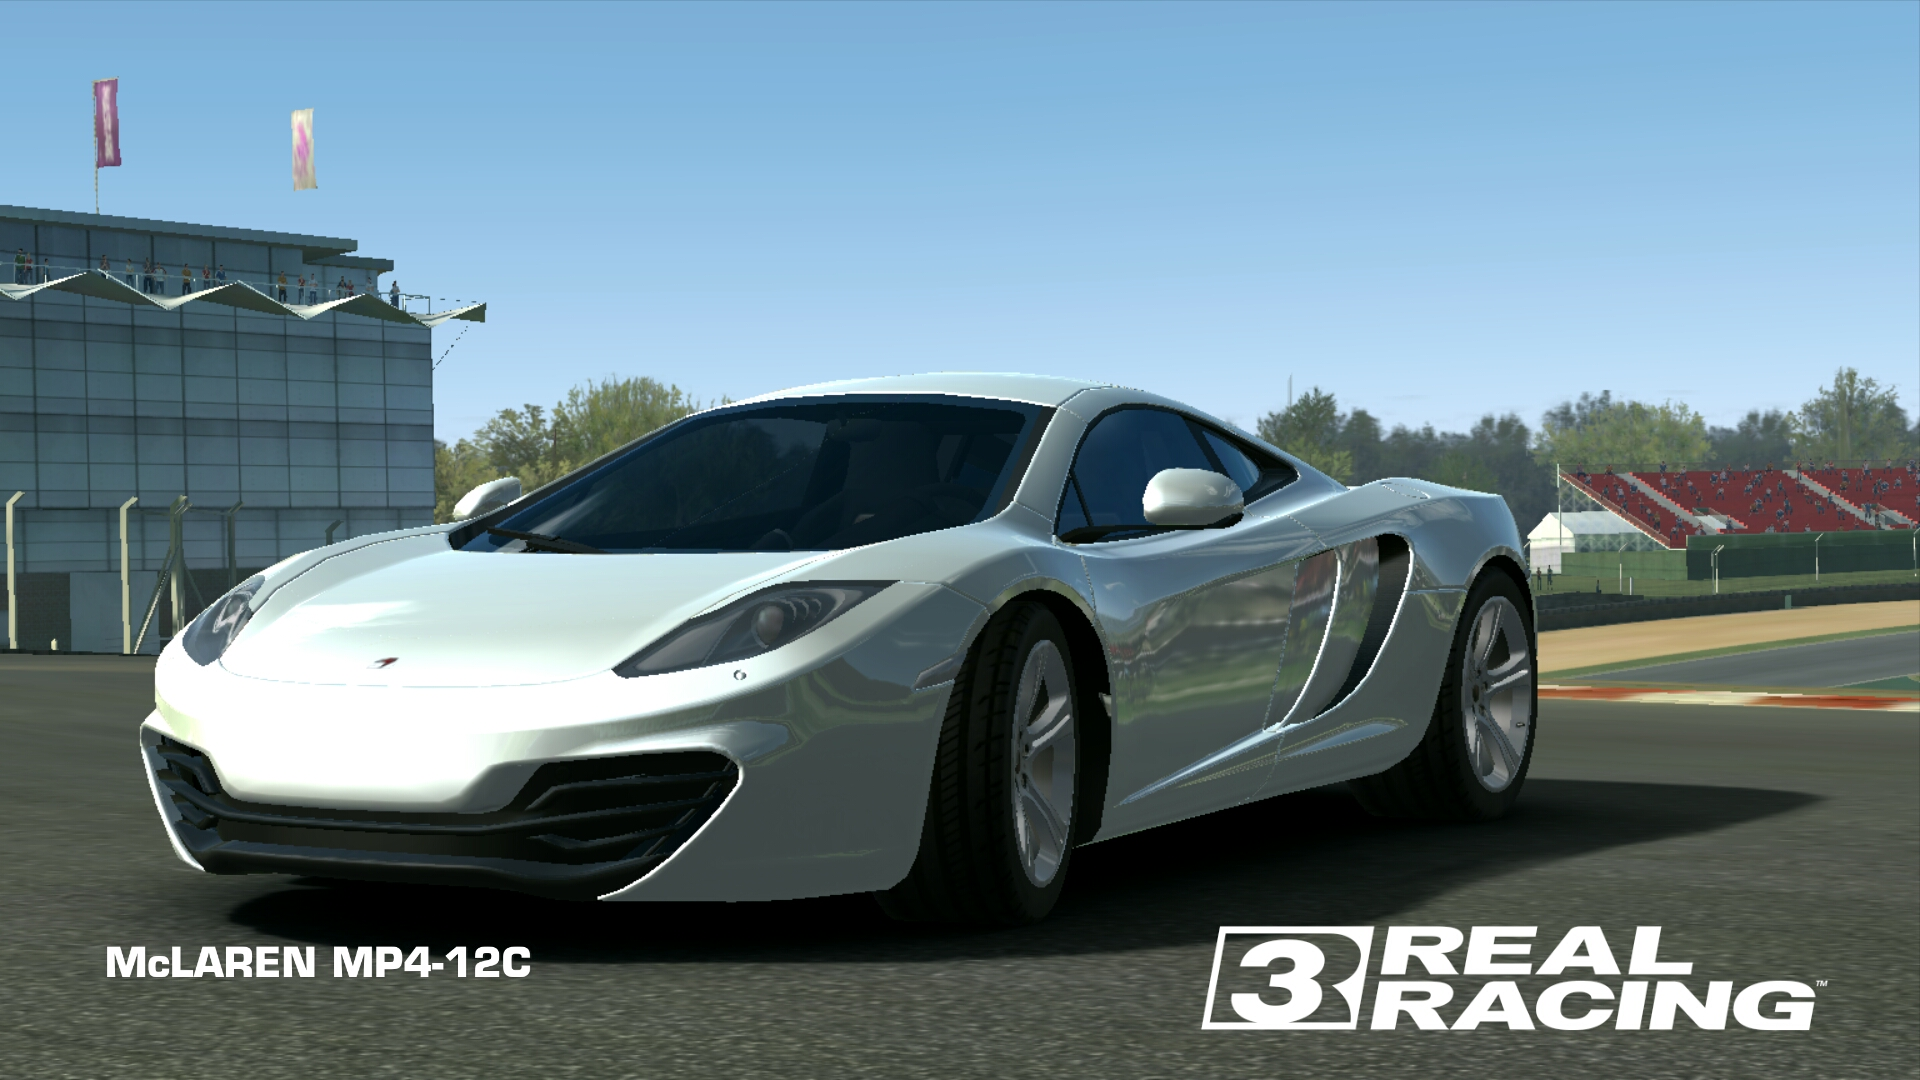 McLAREN MP4-12C | Real Racing 3 Wiki | FANDOM powered by Wikia